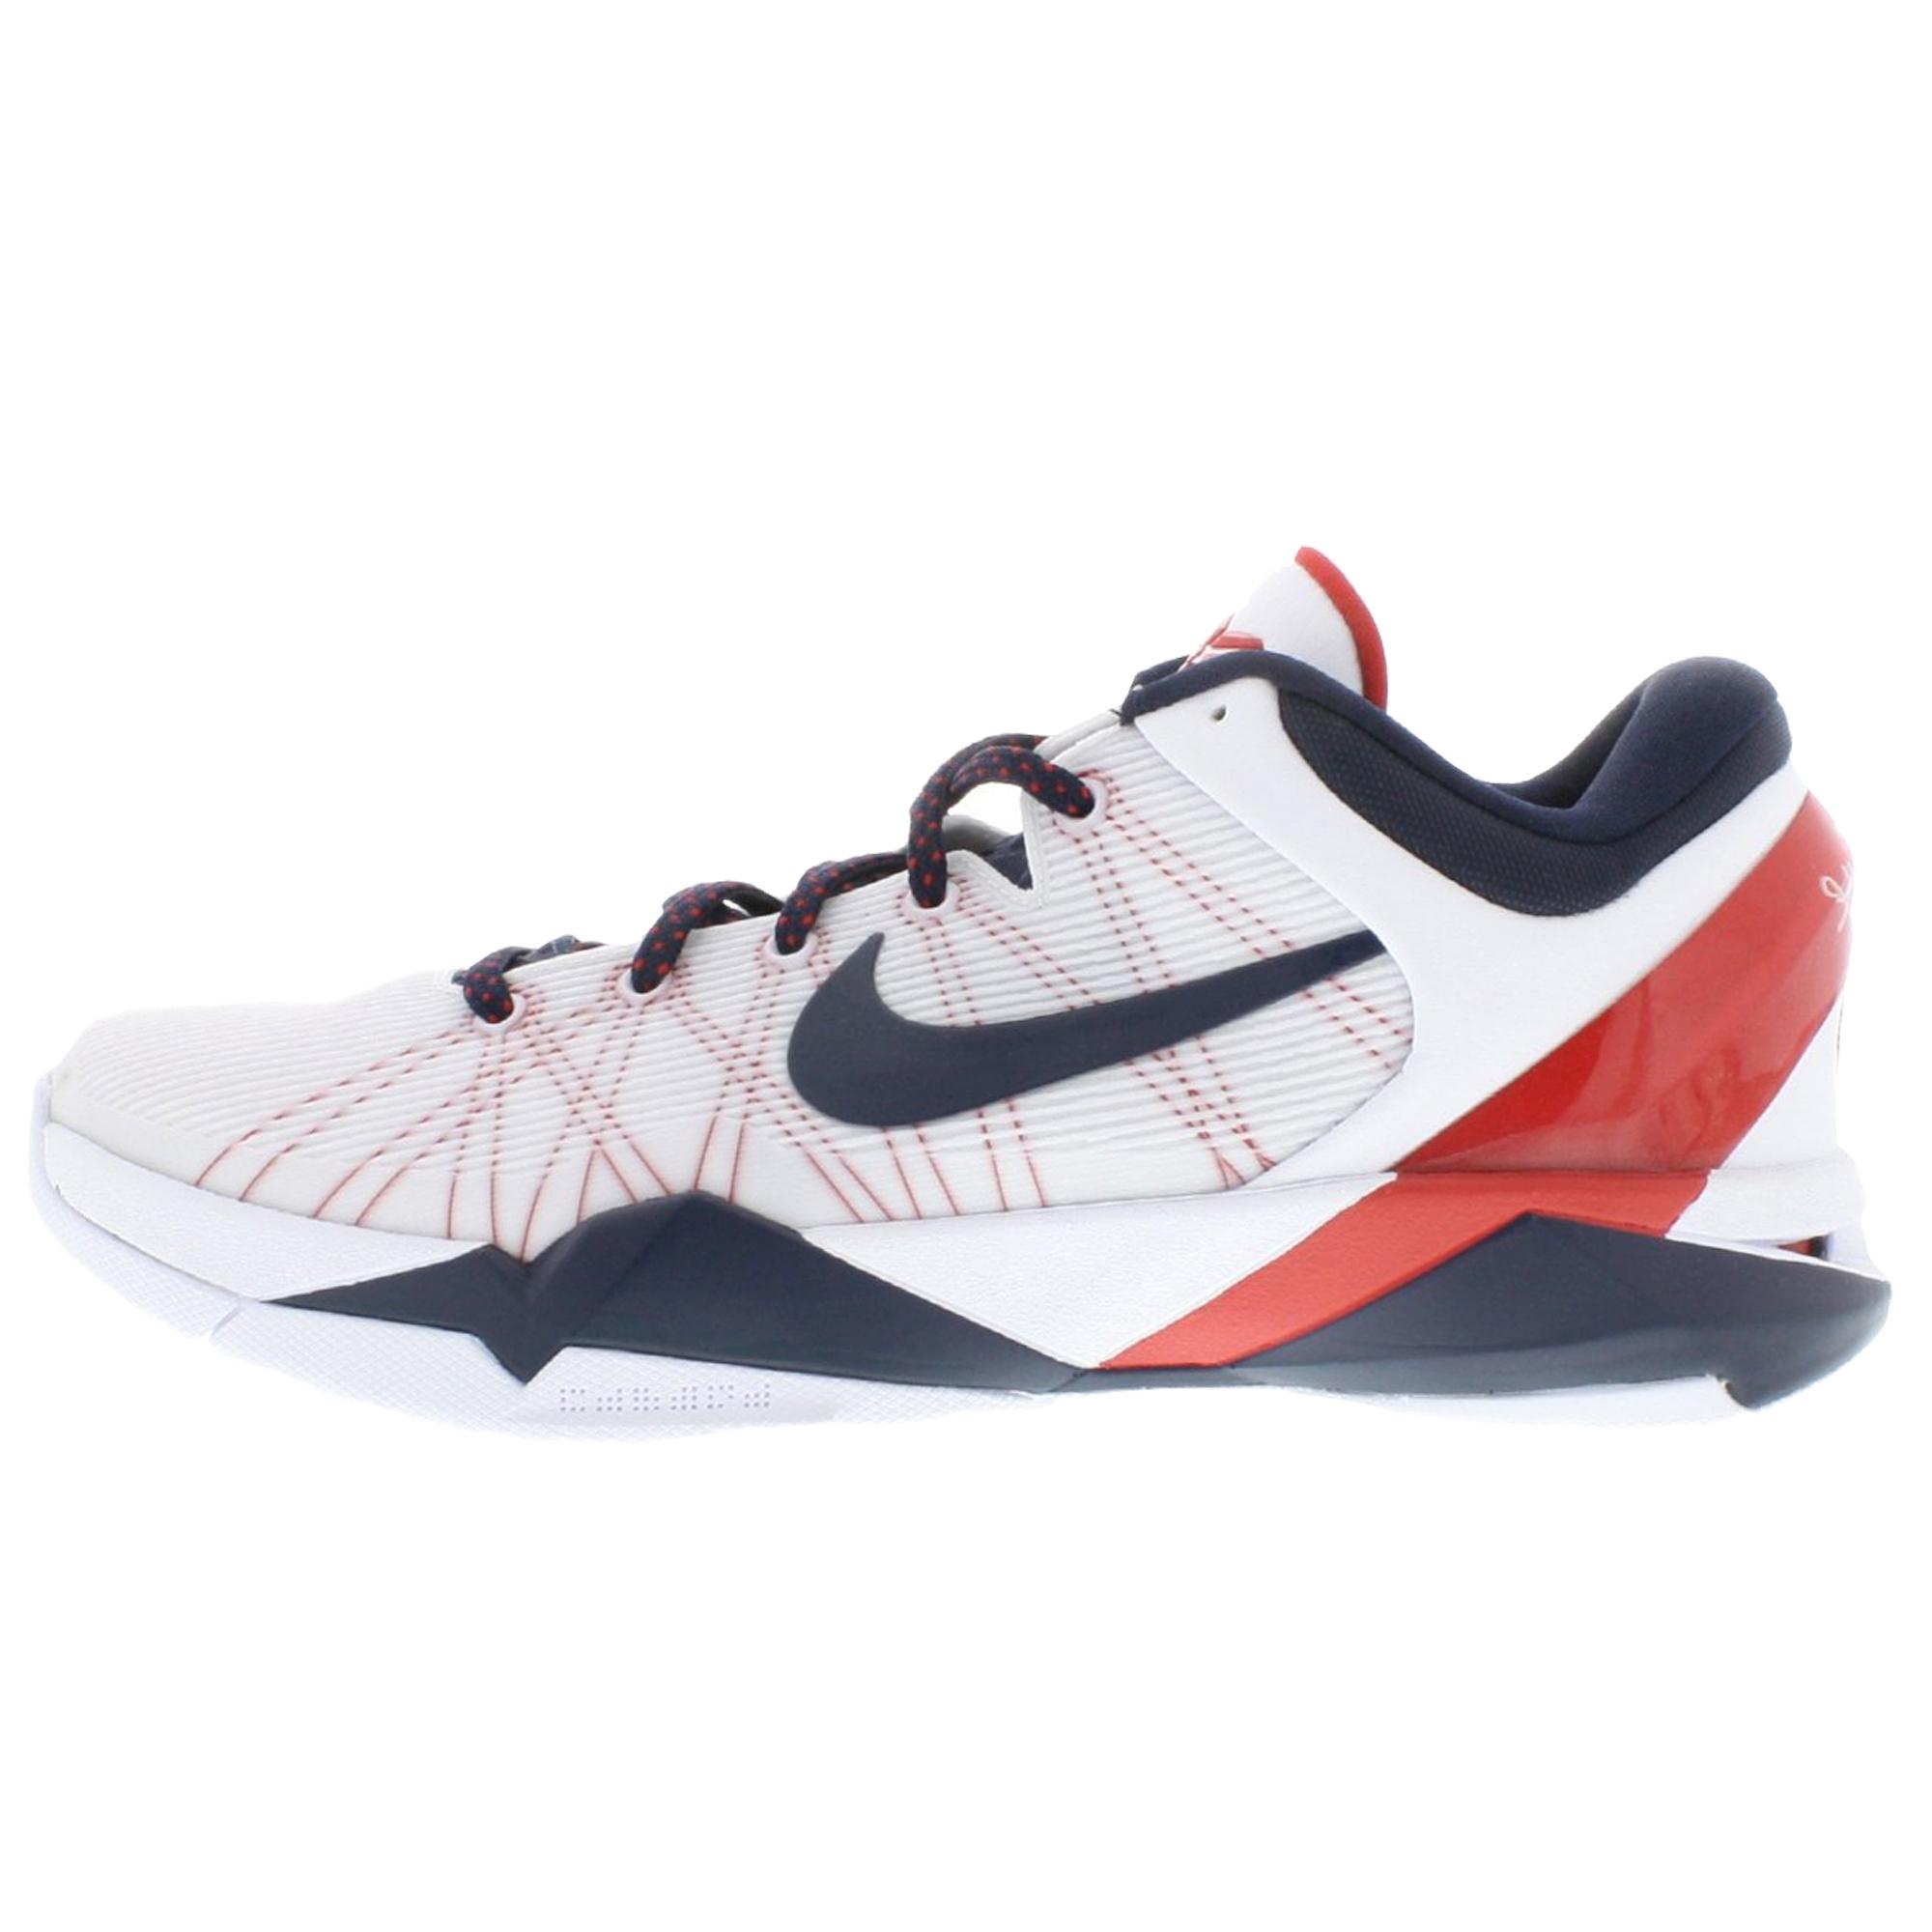 cheap for discount 646d7 14340 Nike Zoom Kobe Bryant VII System Erkek Basketbol Ayakkabısı